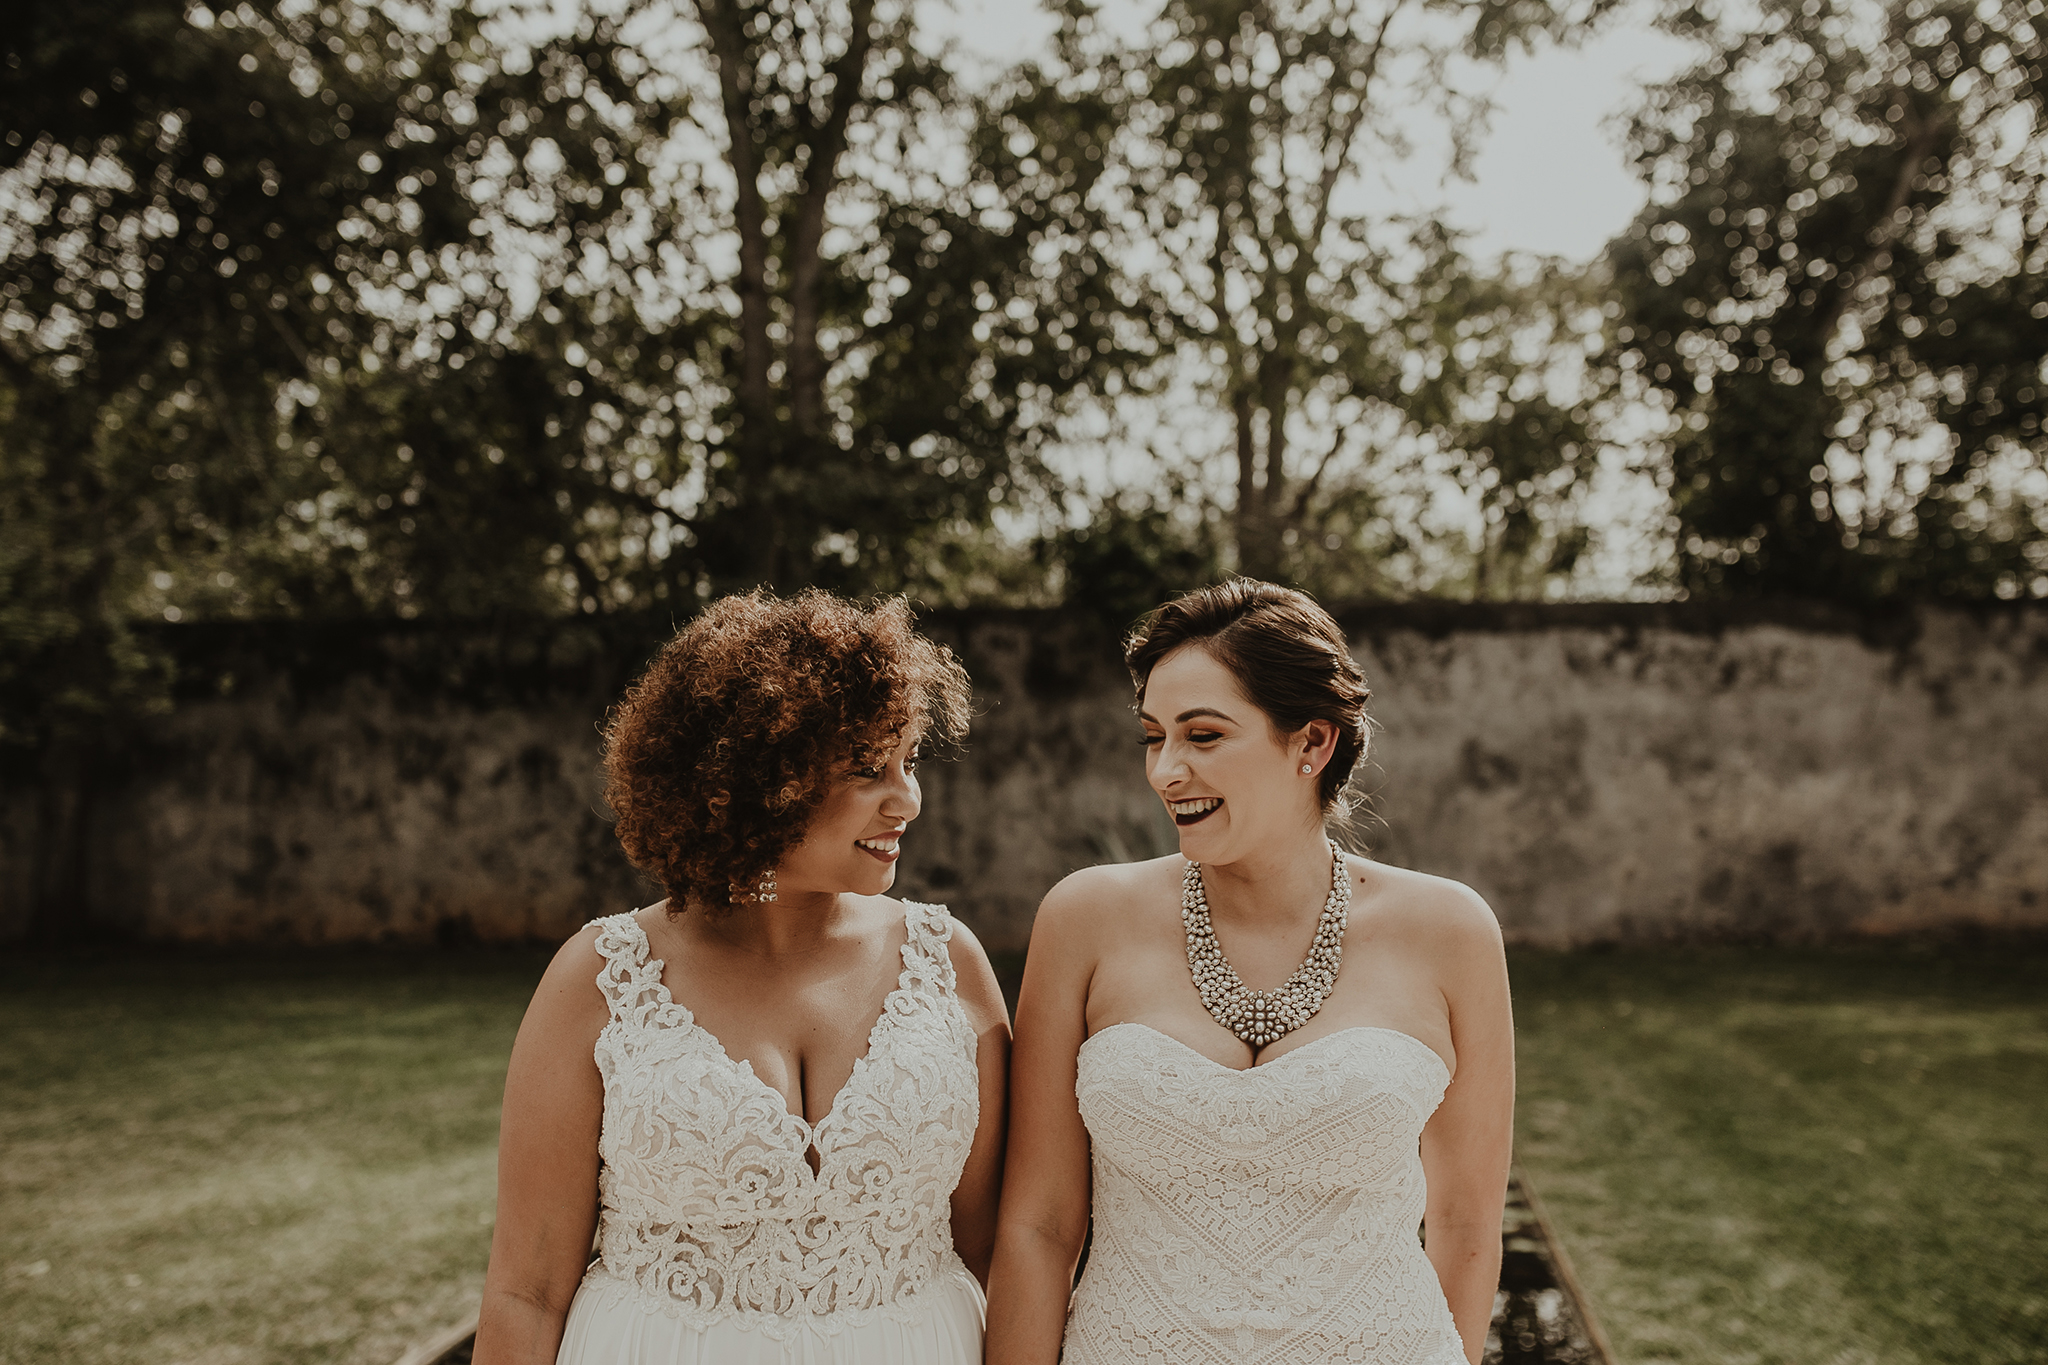 0147V&Aslide_HaciendaSacChic_WeddingGay_WeddingDstination_MeridaYucatan_HaciendasMerida_BodasMexico_BodasYucatan_Boda_Destino.jpg